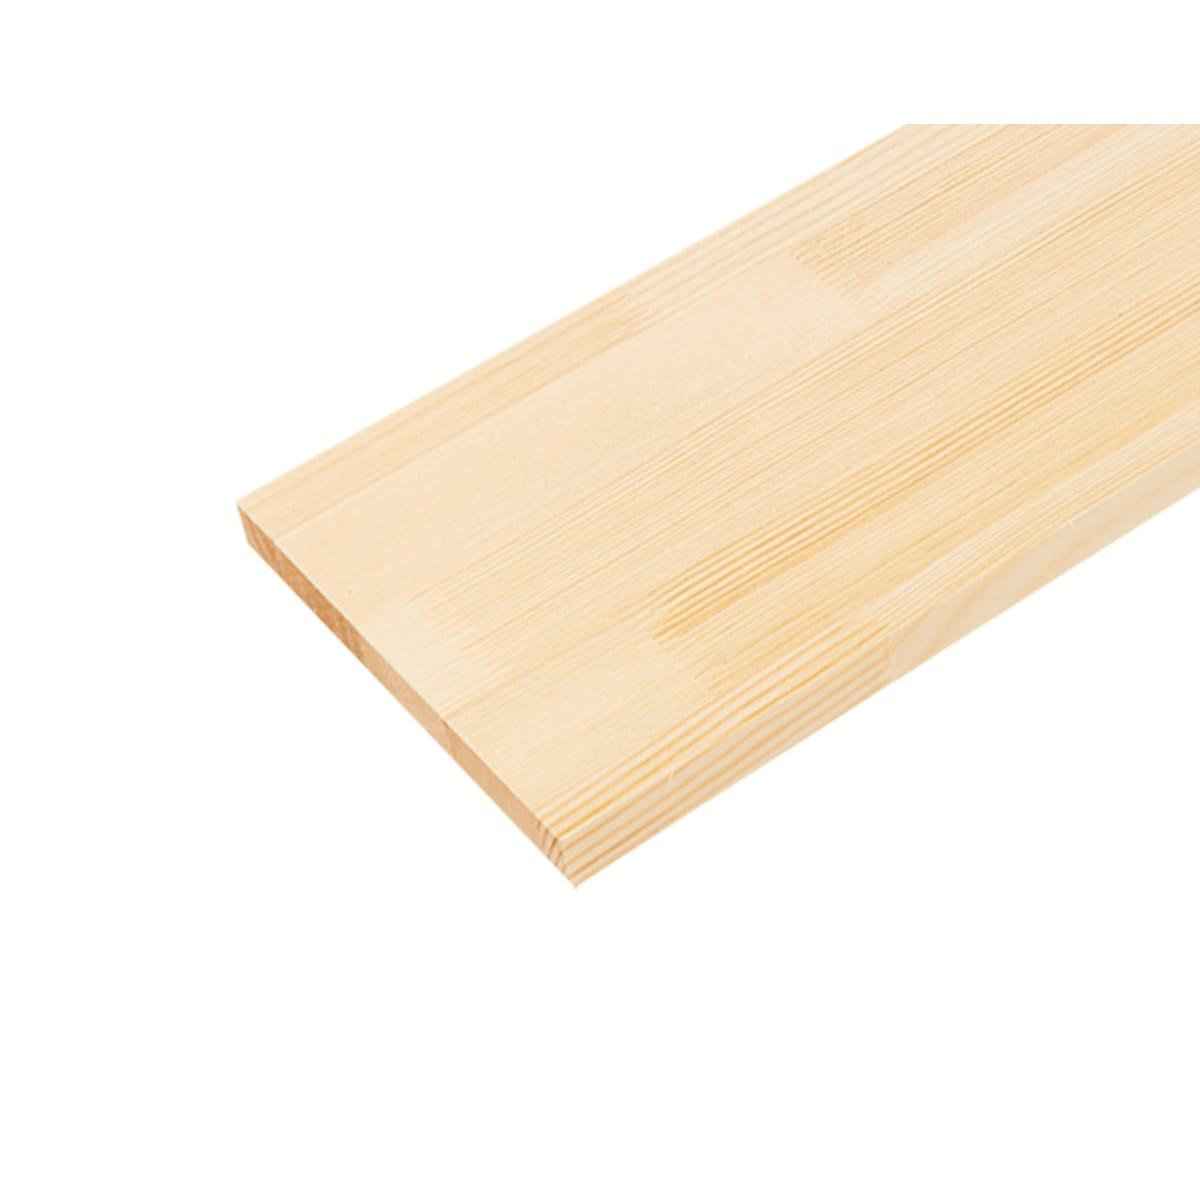 Панель деревянная экстра 11х90х1500 мм